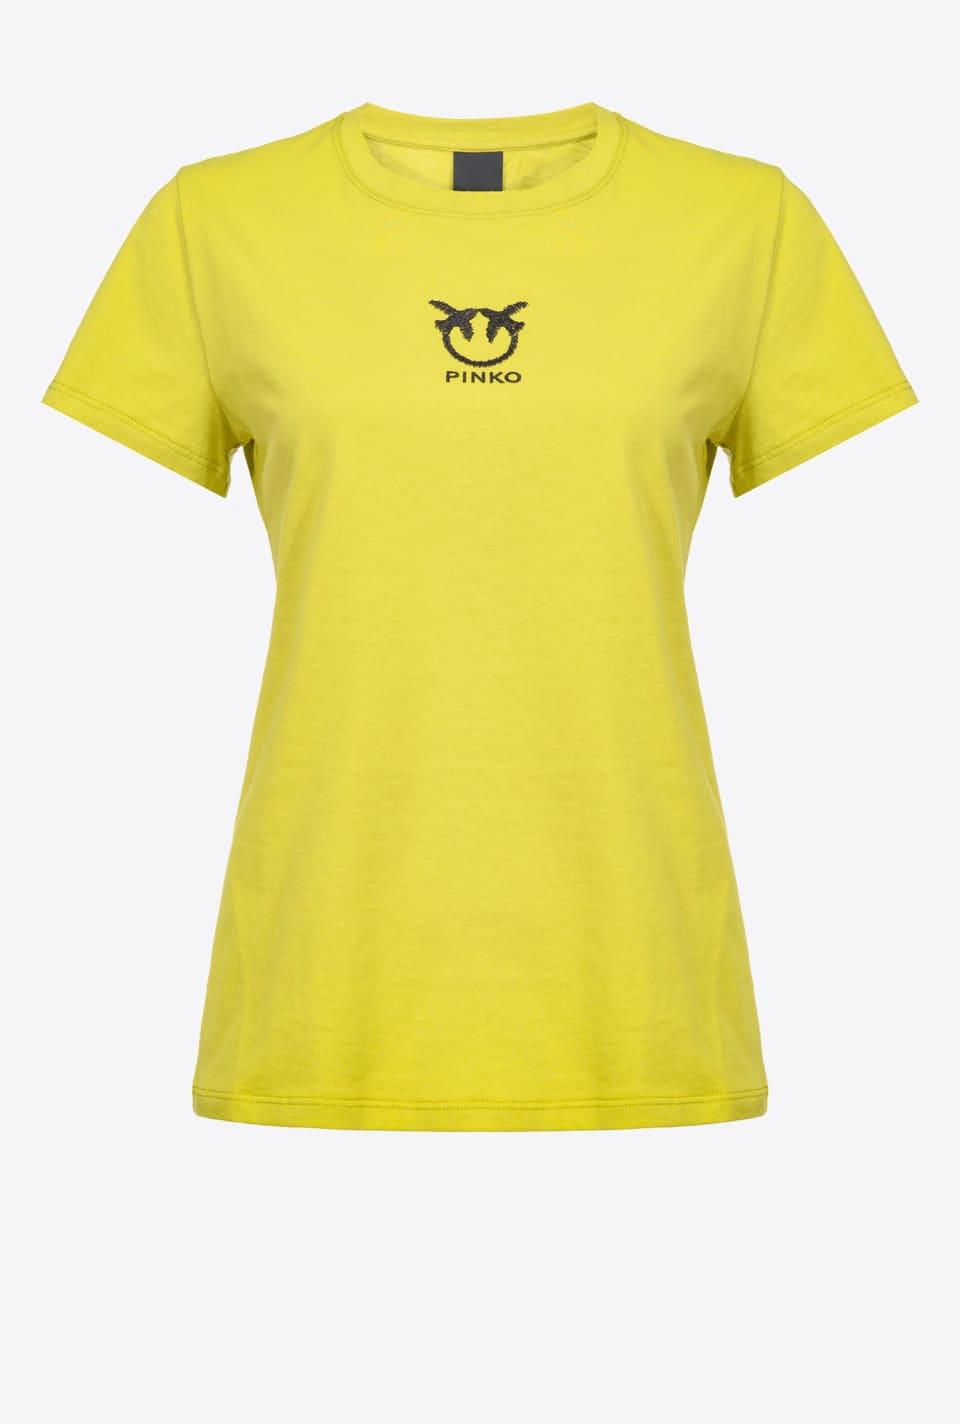 Love Birds logo T-shirt - Pinko